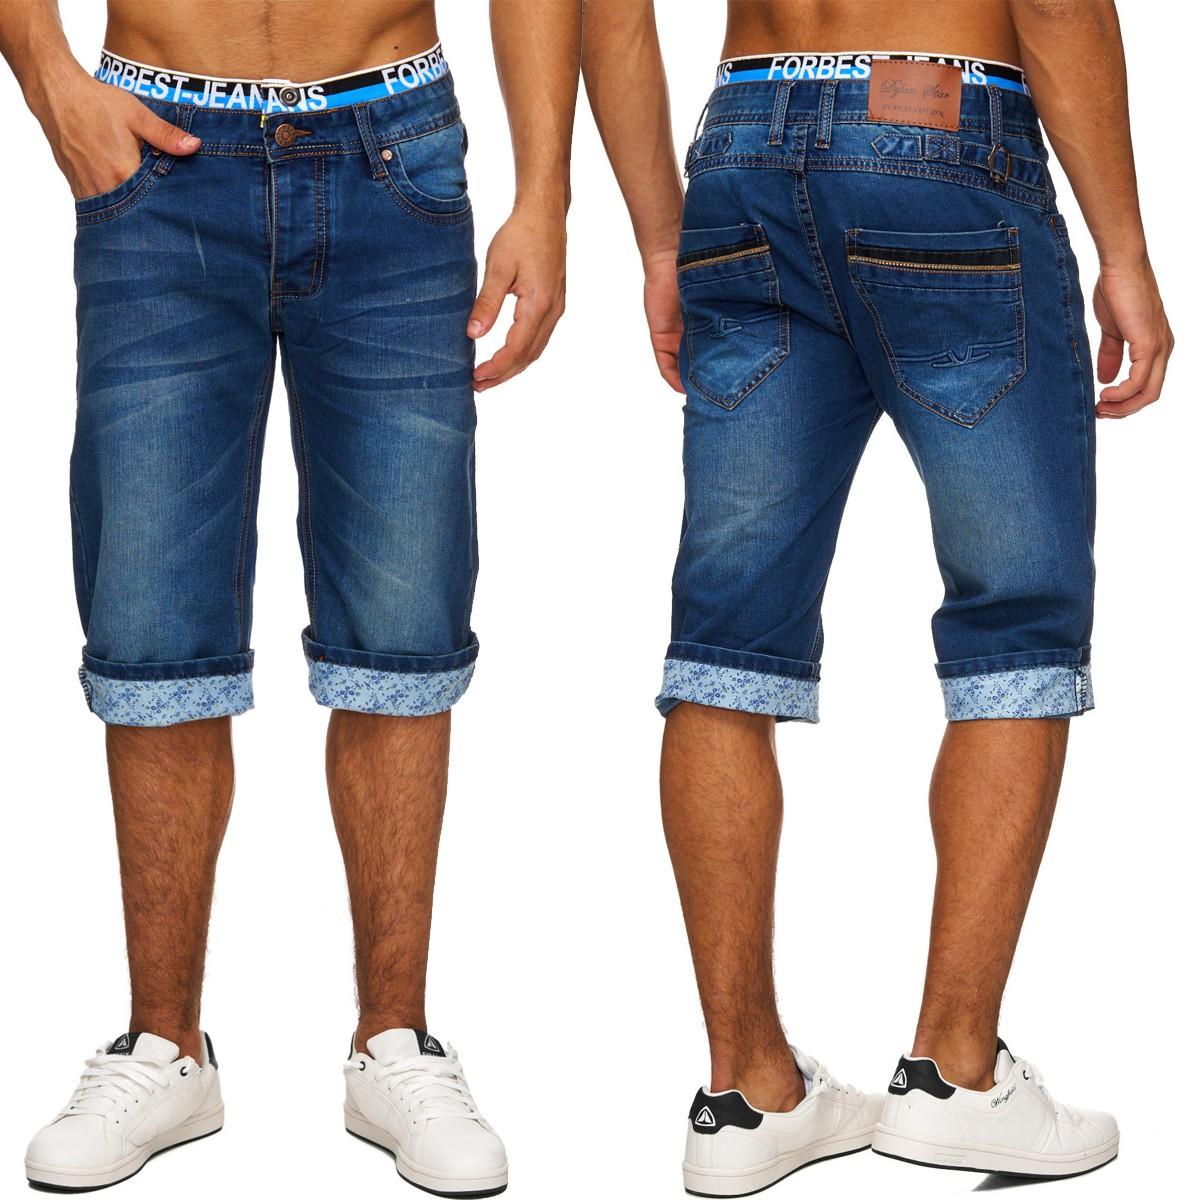 5110ca0b036532 Herren Bermuda Denim Shorts Jeansshorts lang Jeans Washed Hose blau 3/4  Plus - Nr 1748